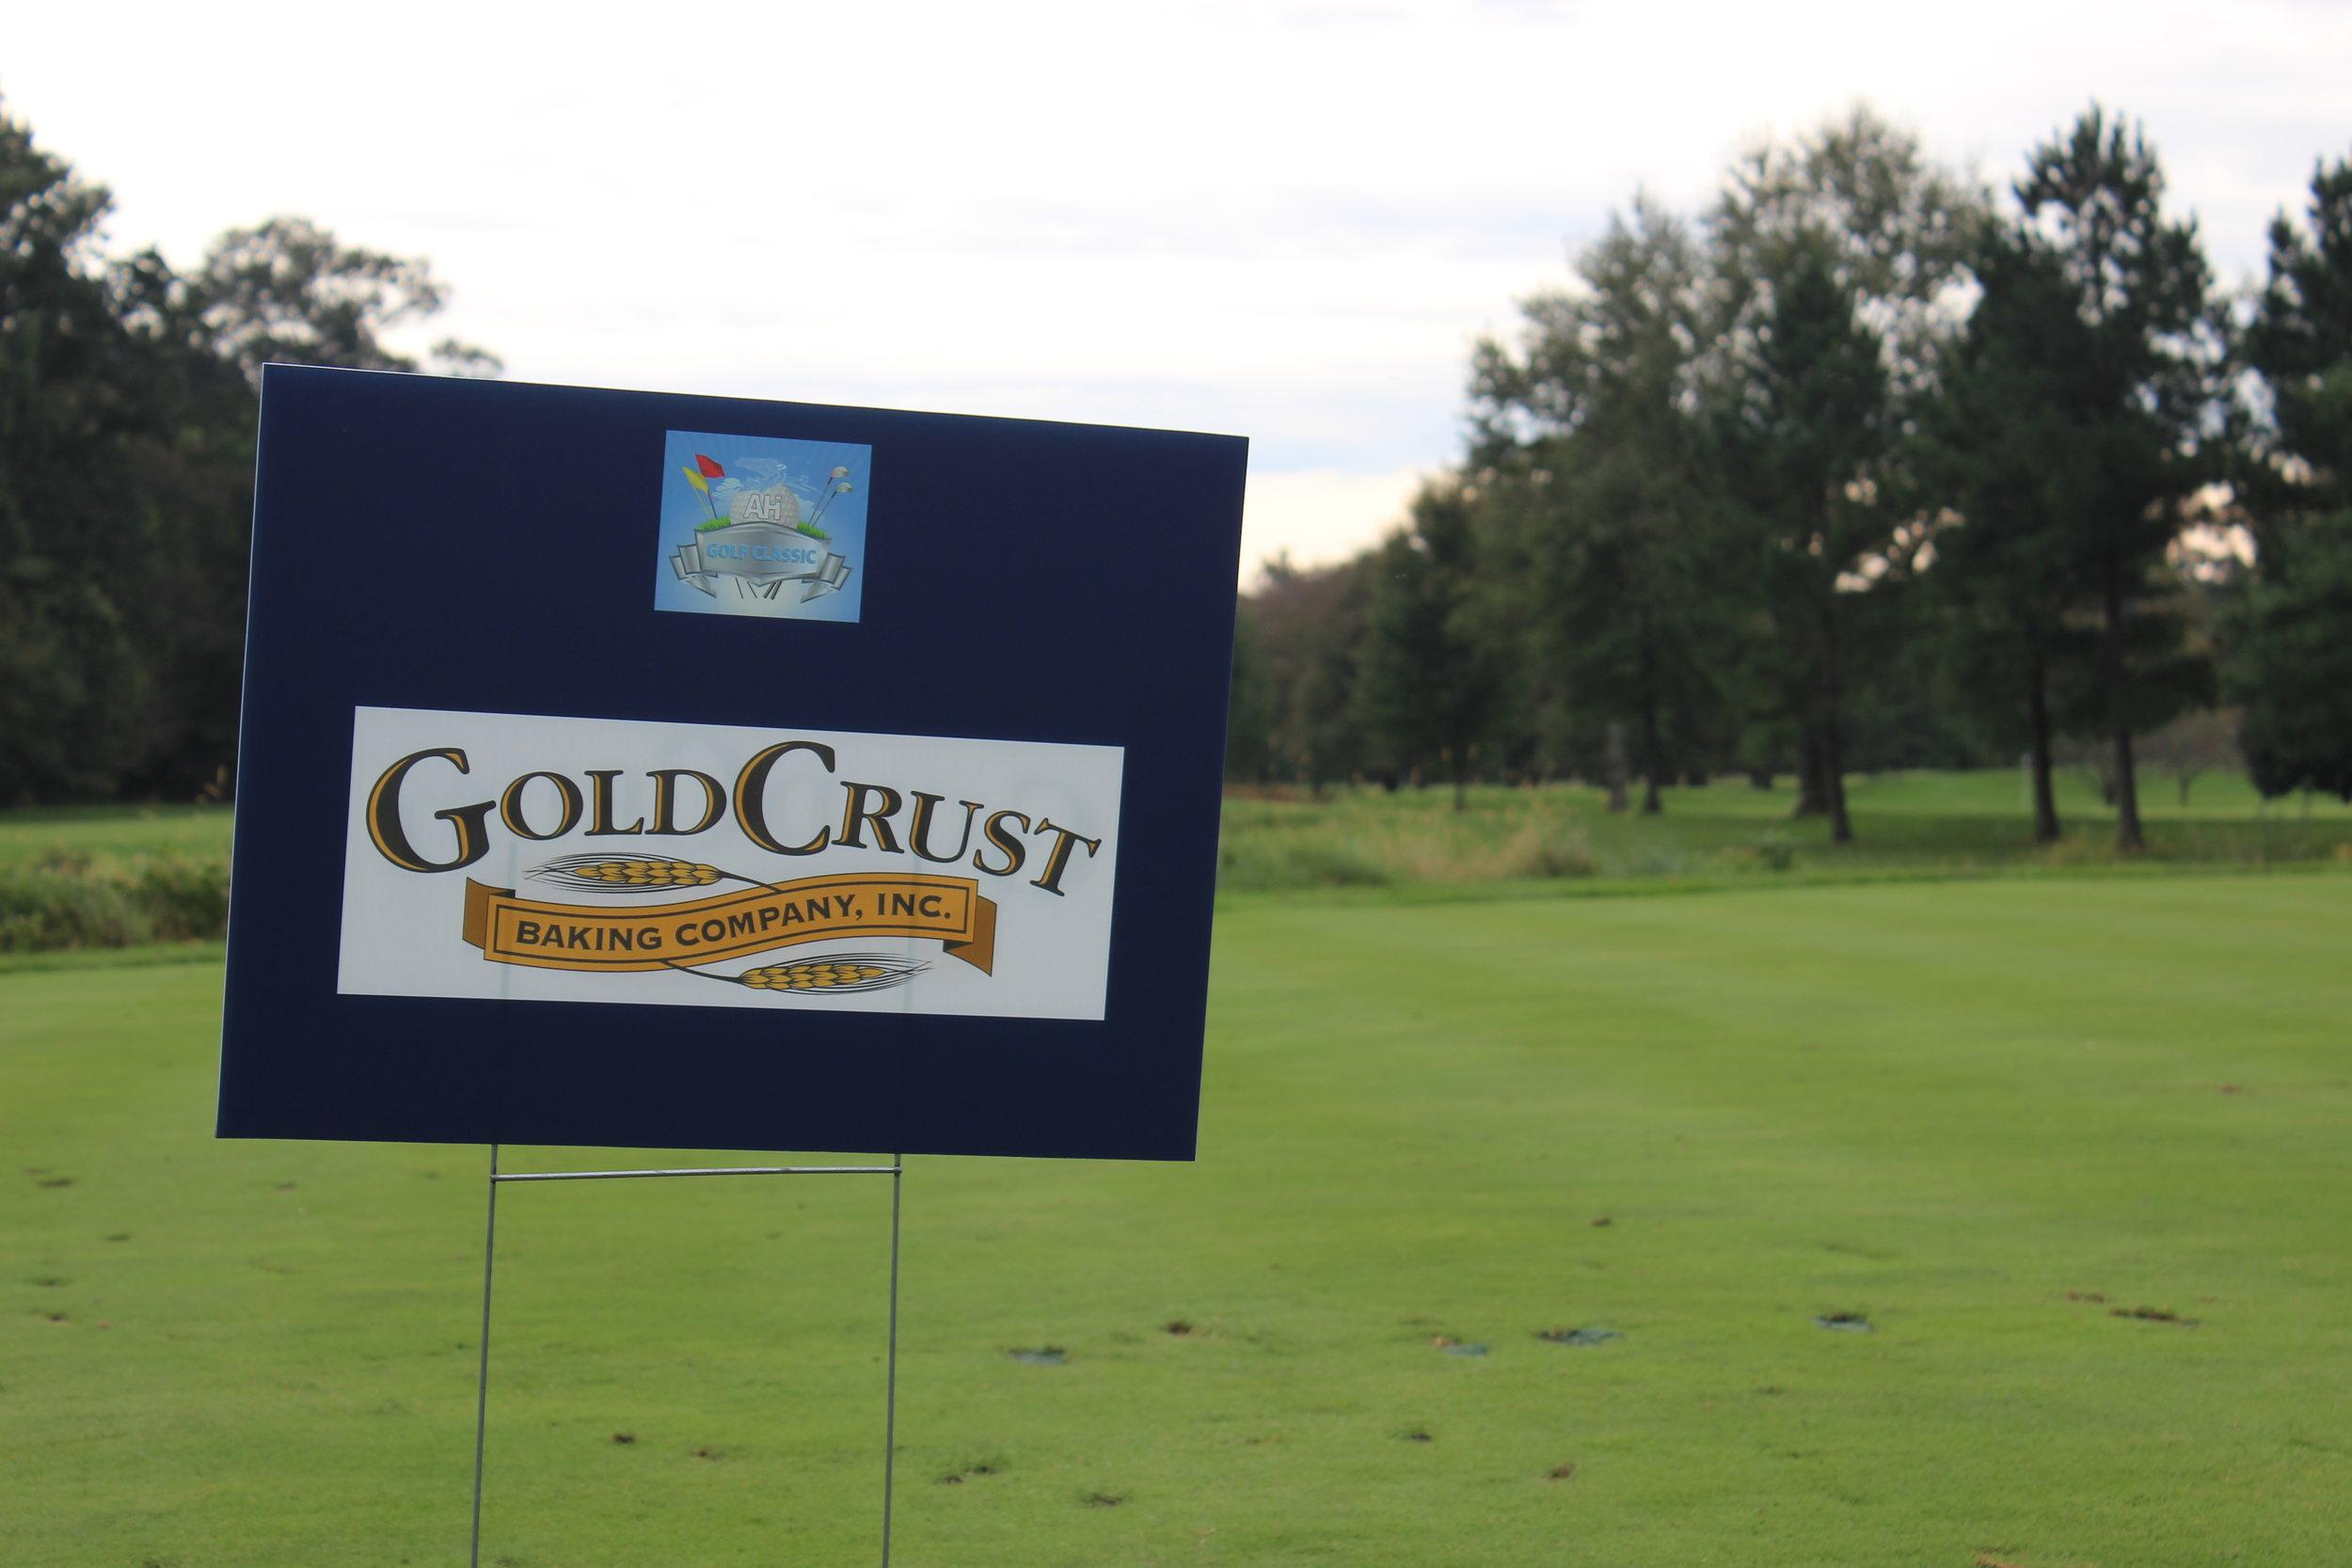 Gold Crust Bakery, Hole Sponsor.